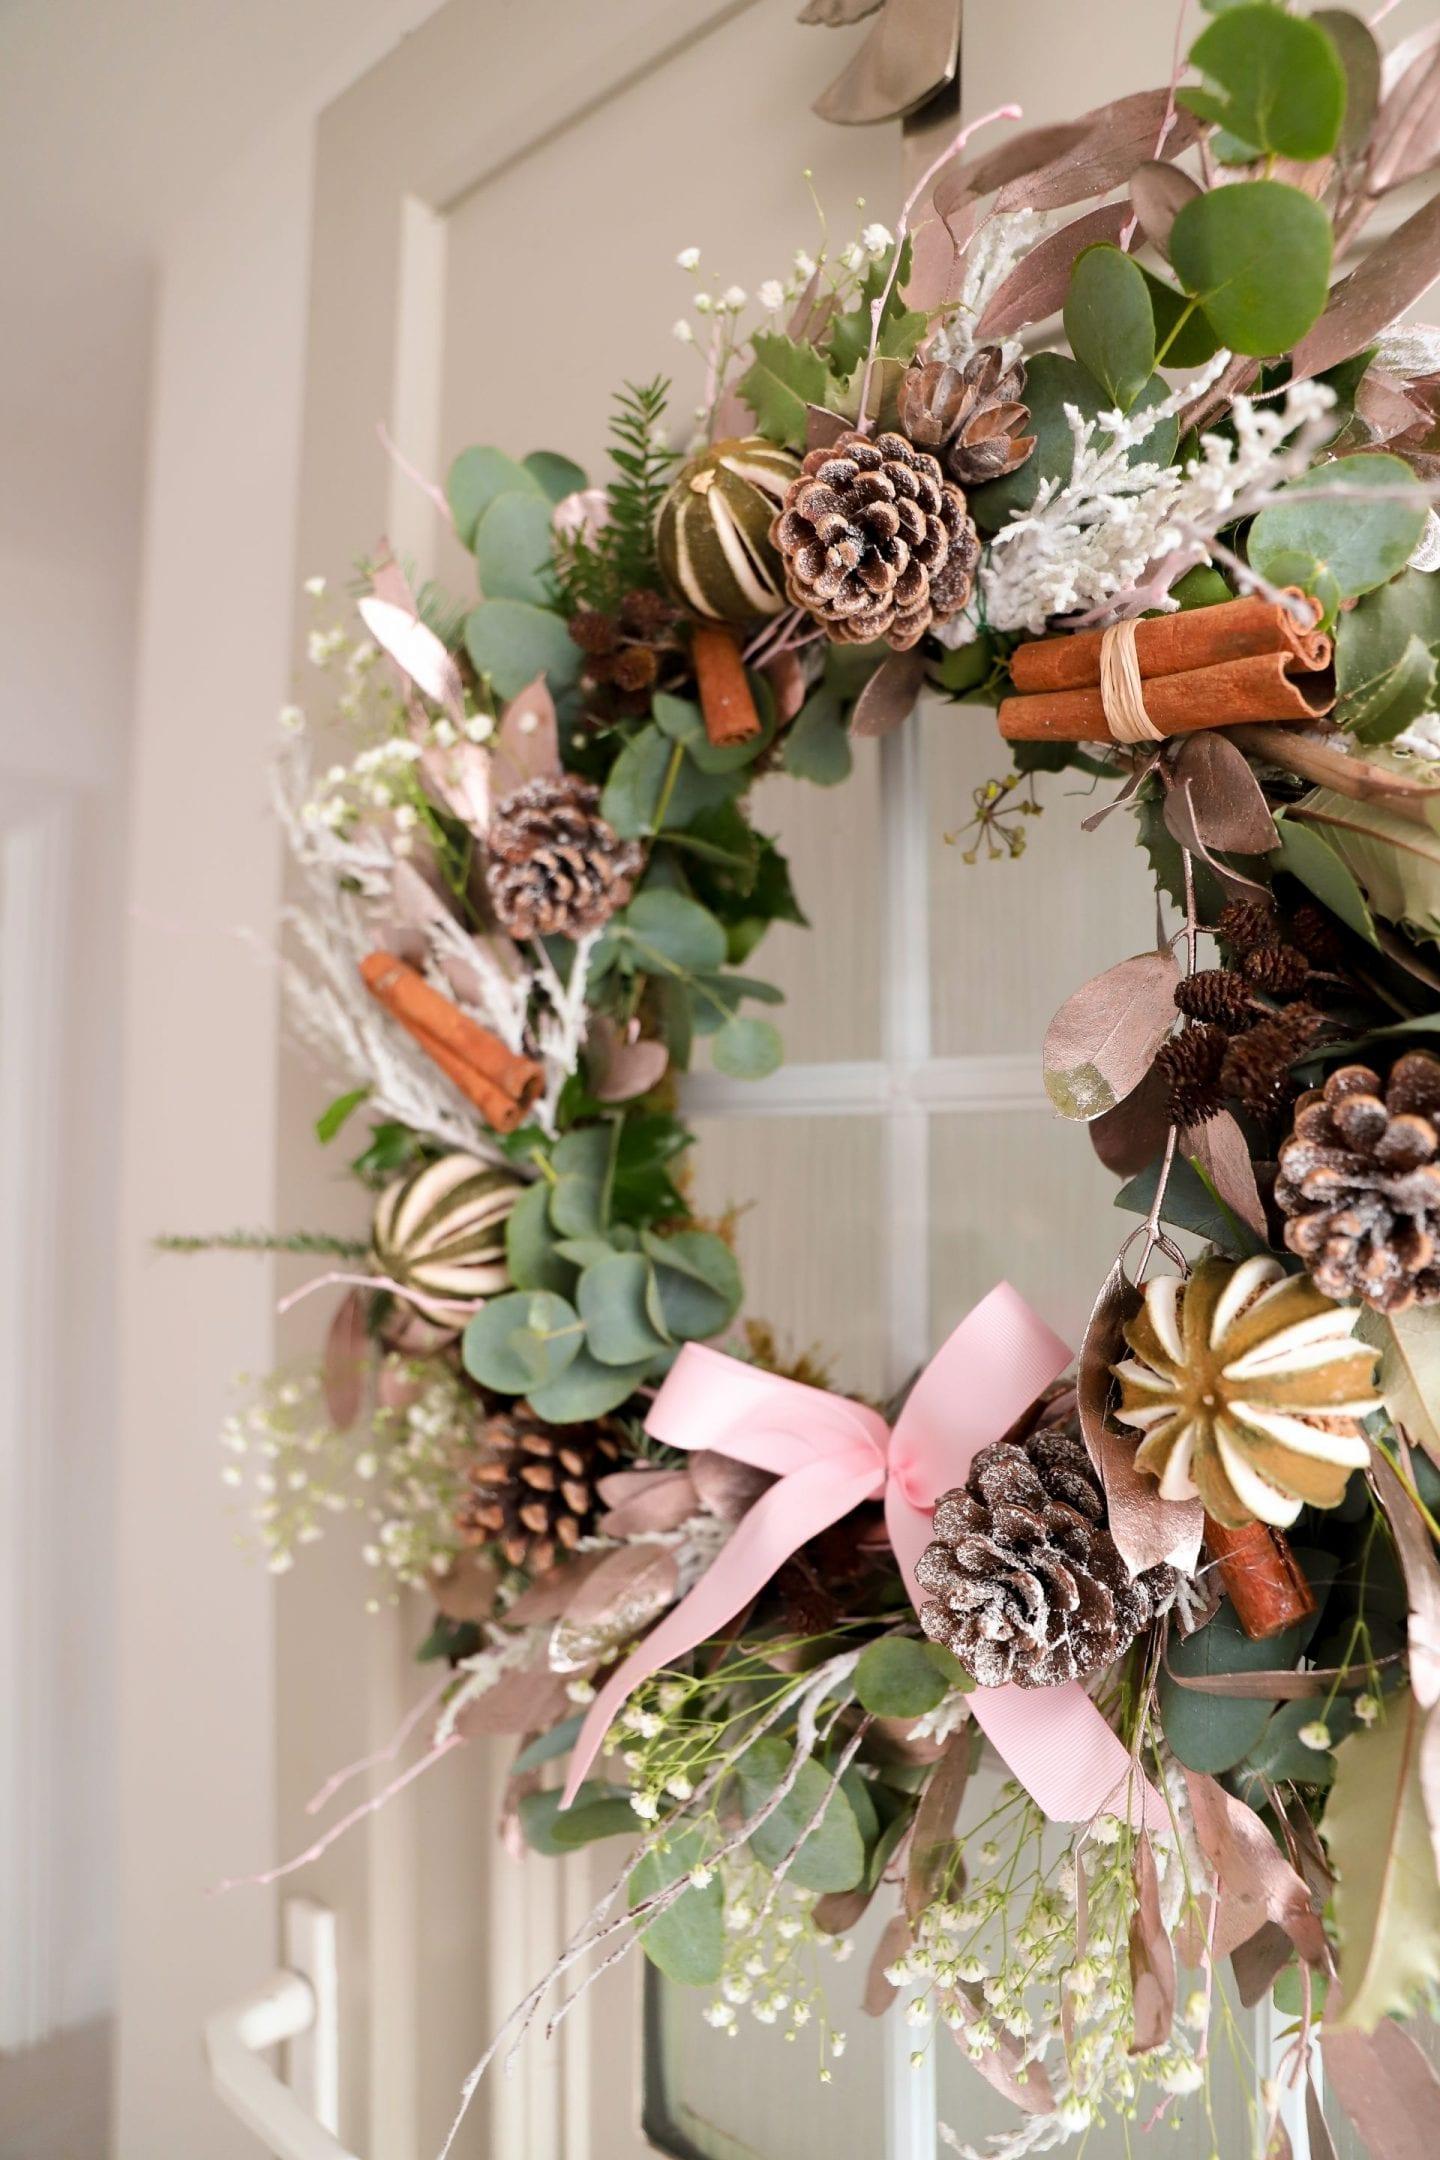 How to make a DIY Christmas Wreath